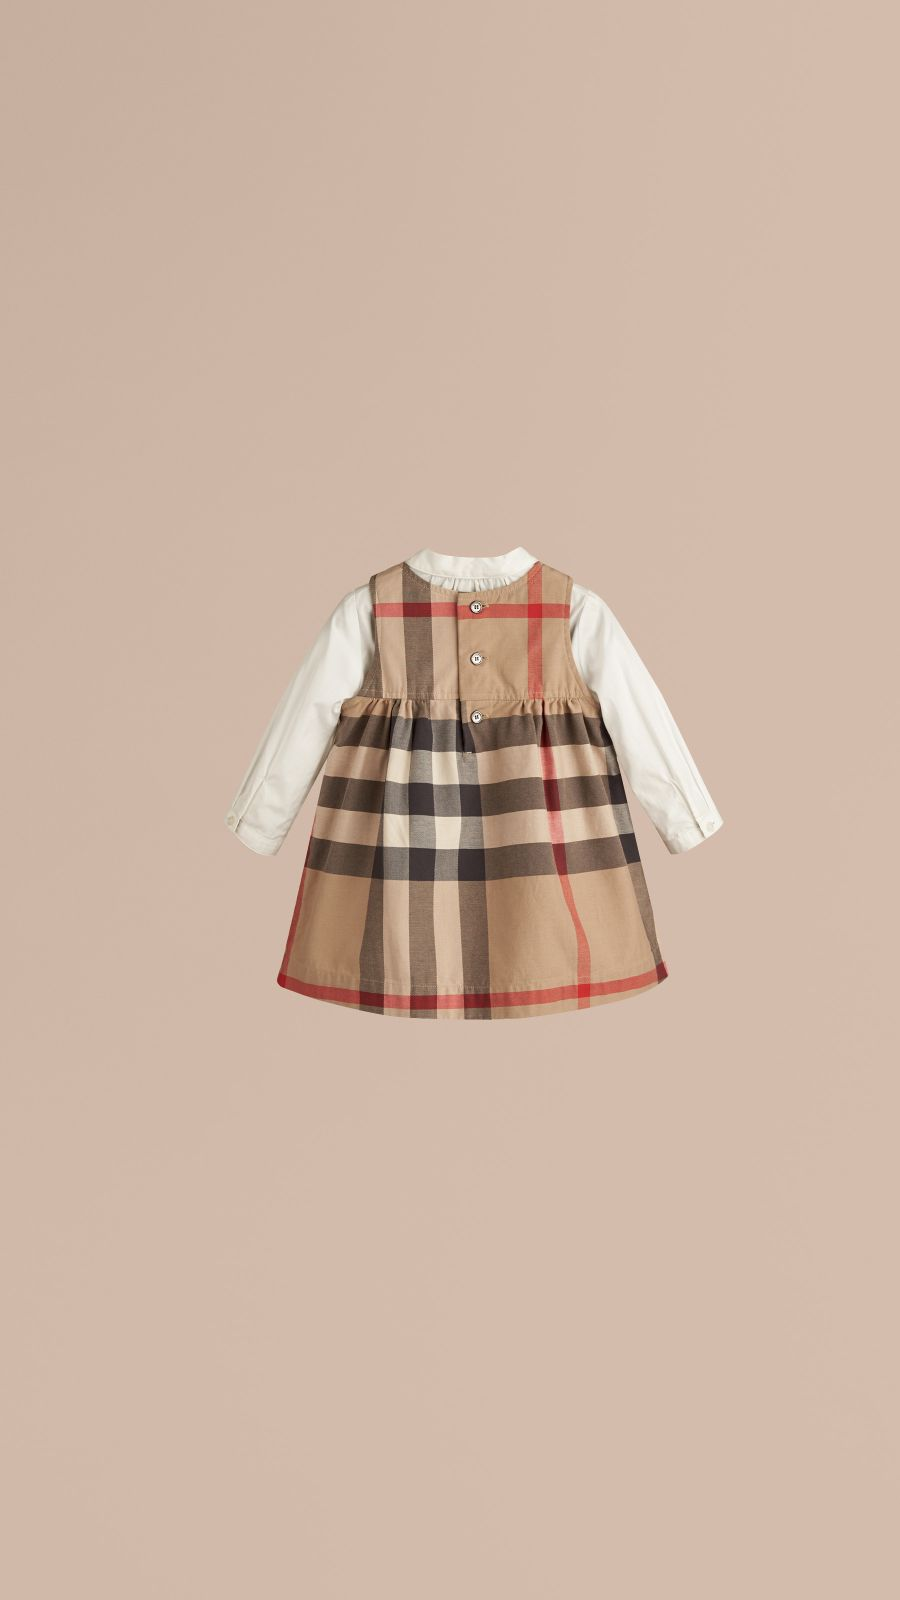 New classic Check Cotton Dress - Image 3